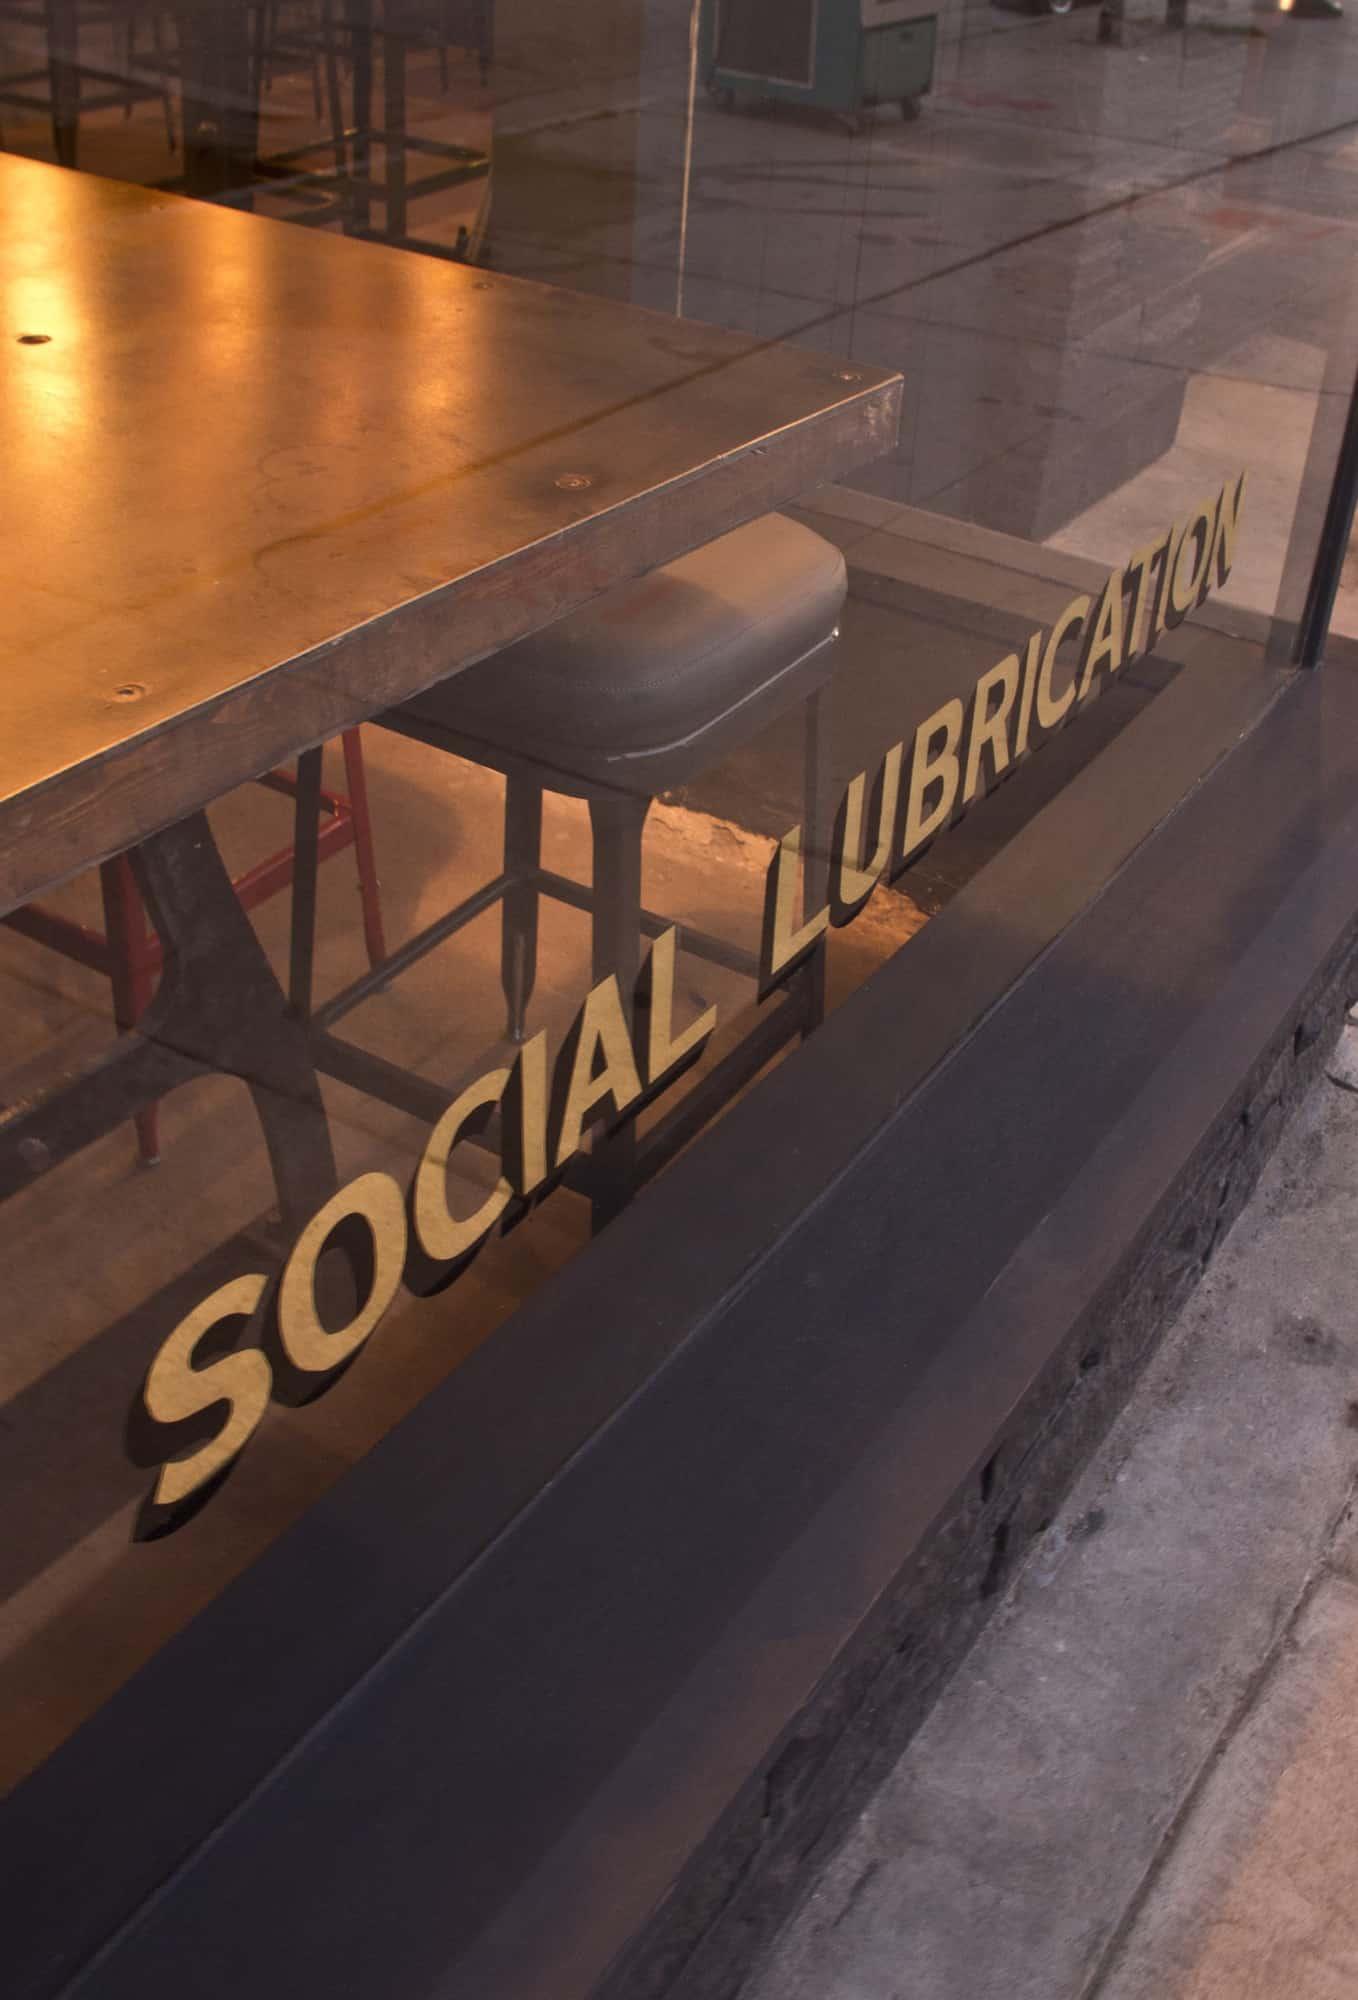 TheTripel_SocialLub